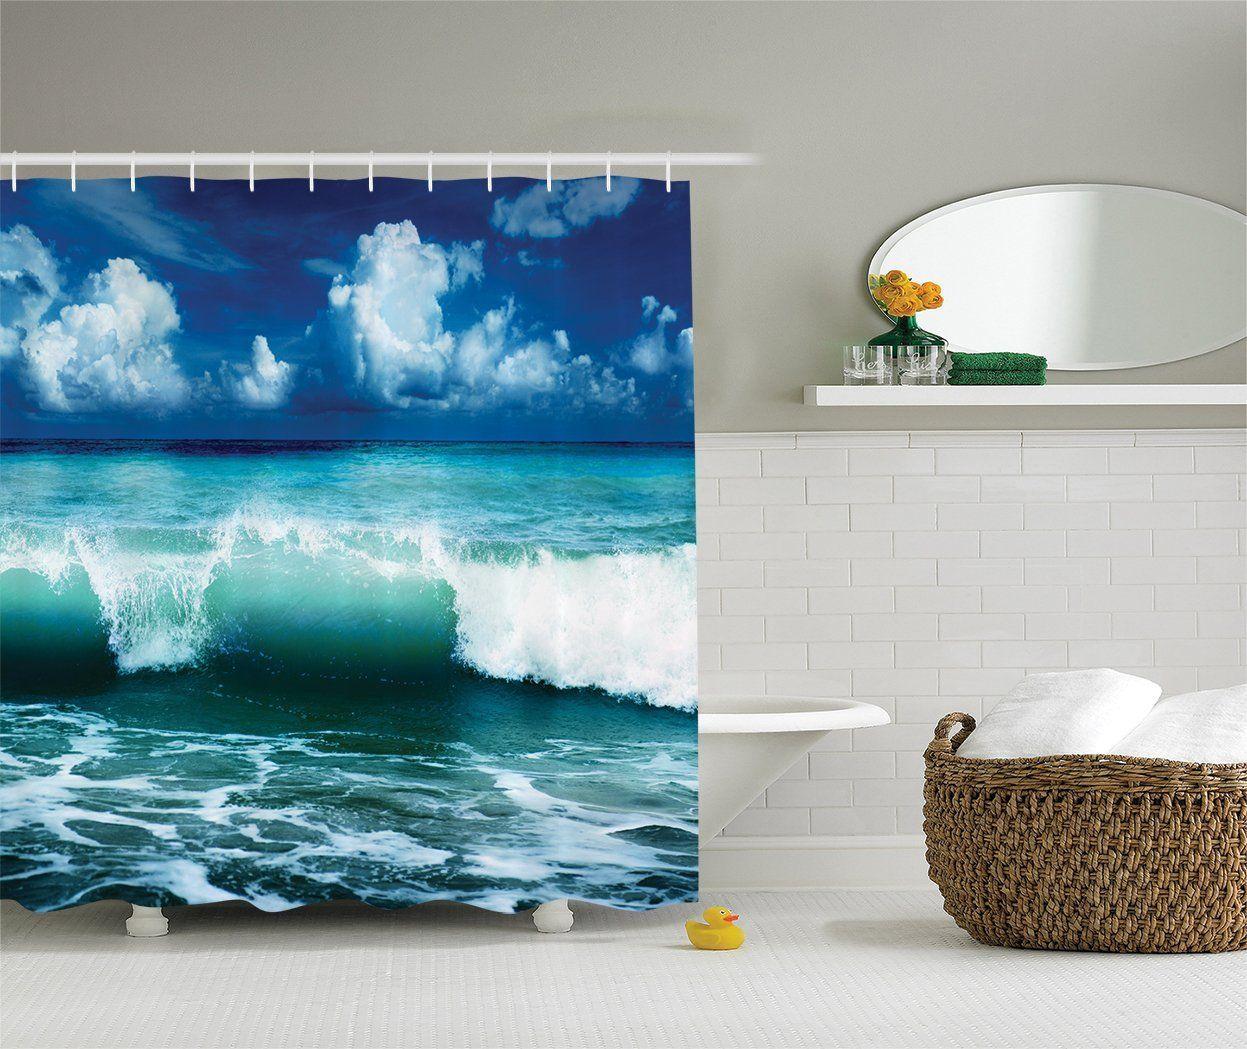 Home Design 3d Keeps Crashing: Crashing Waves Beach Themed Shower Curtain